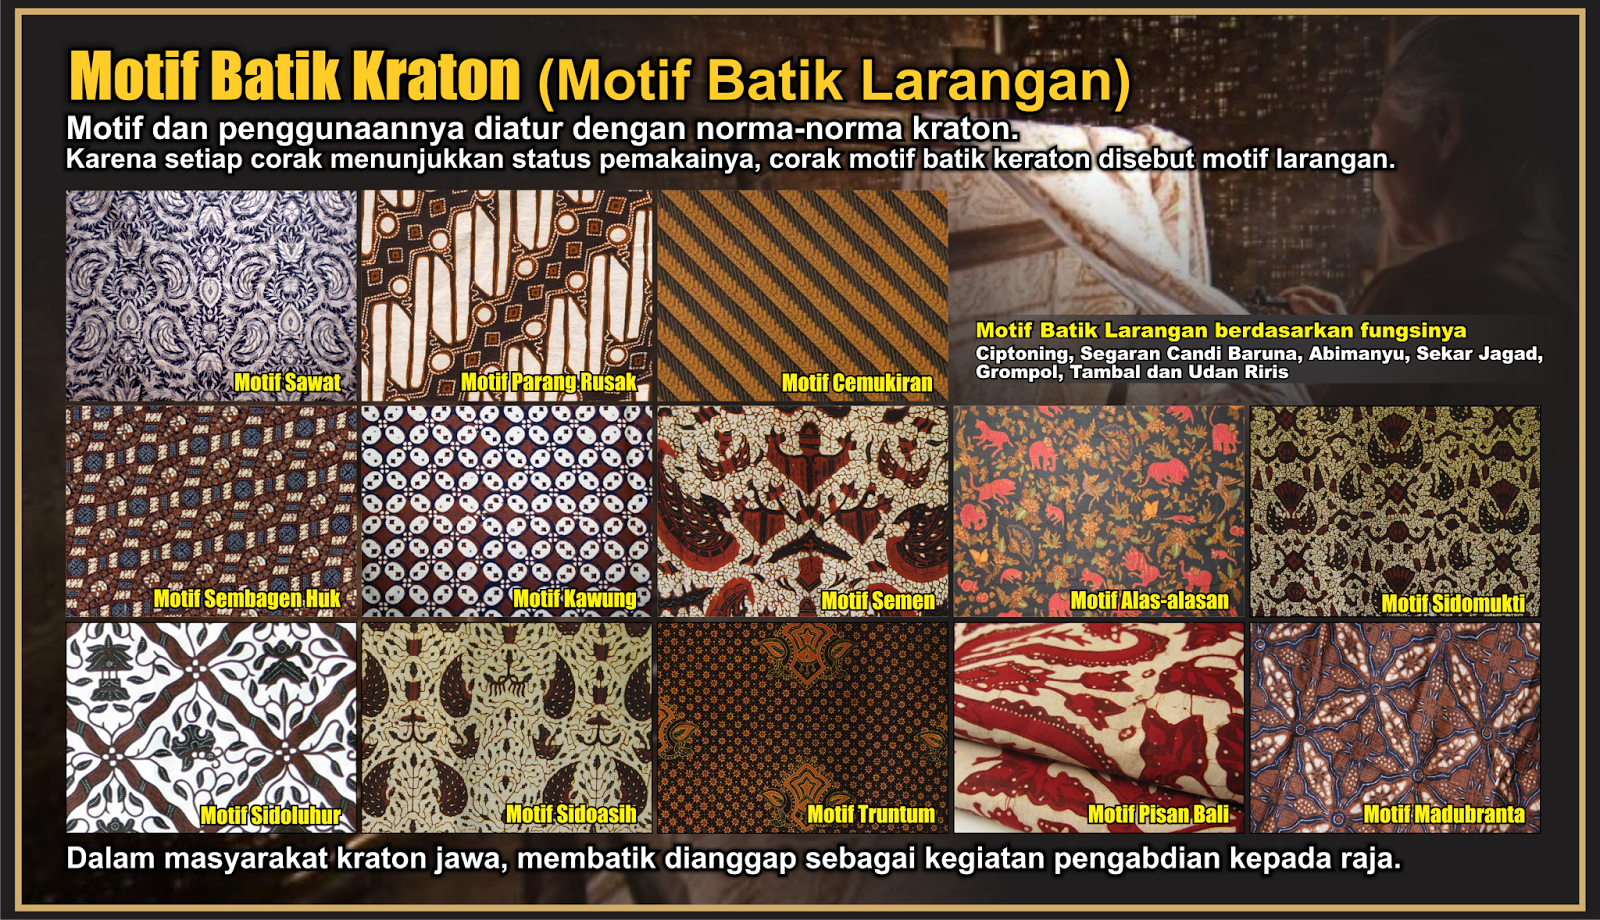 nusantaraku Kebermaknaan Batik Kraton Motif Batik Larangan